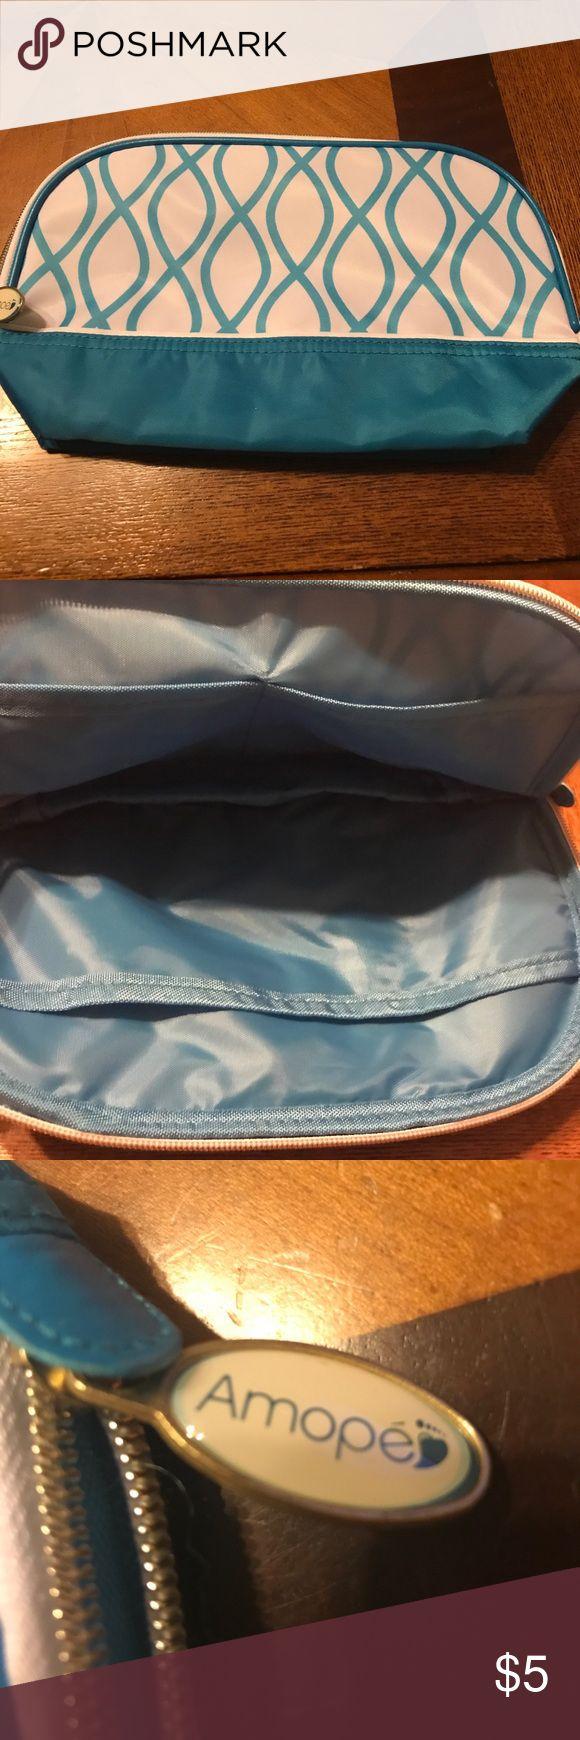 Makeup bag Small overnight makeup bag Amope Bags Cosmetic Bags & Cases